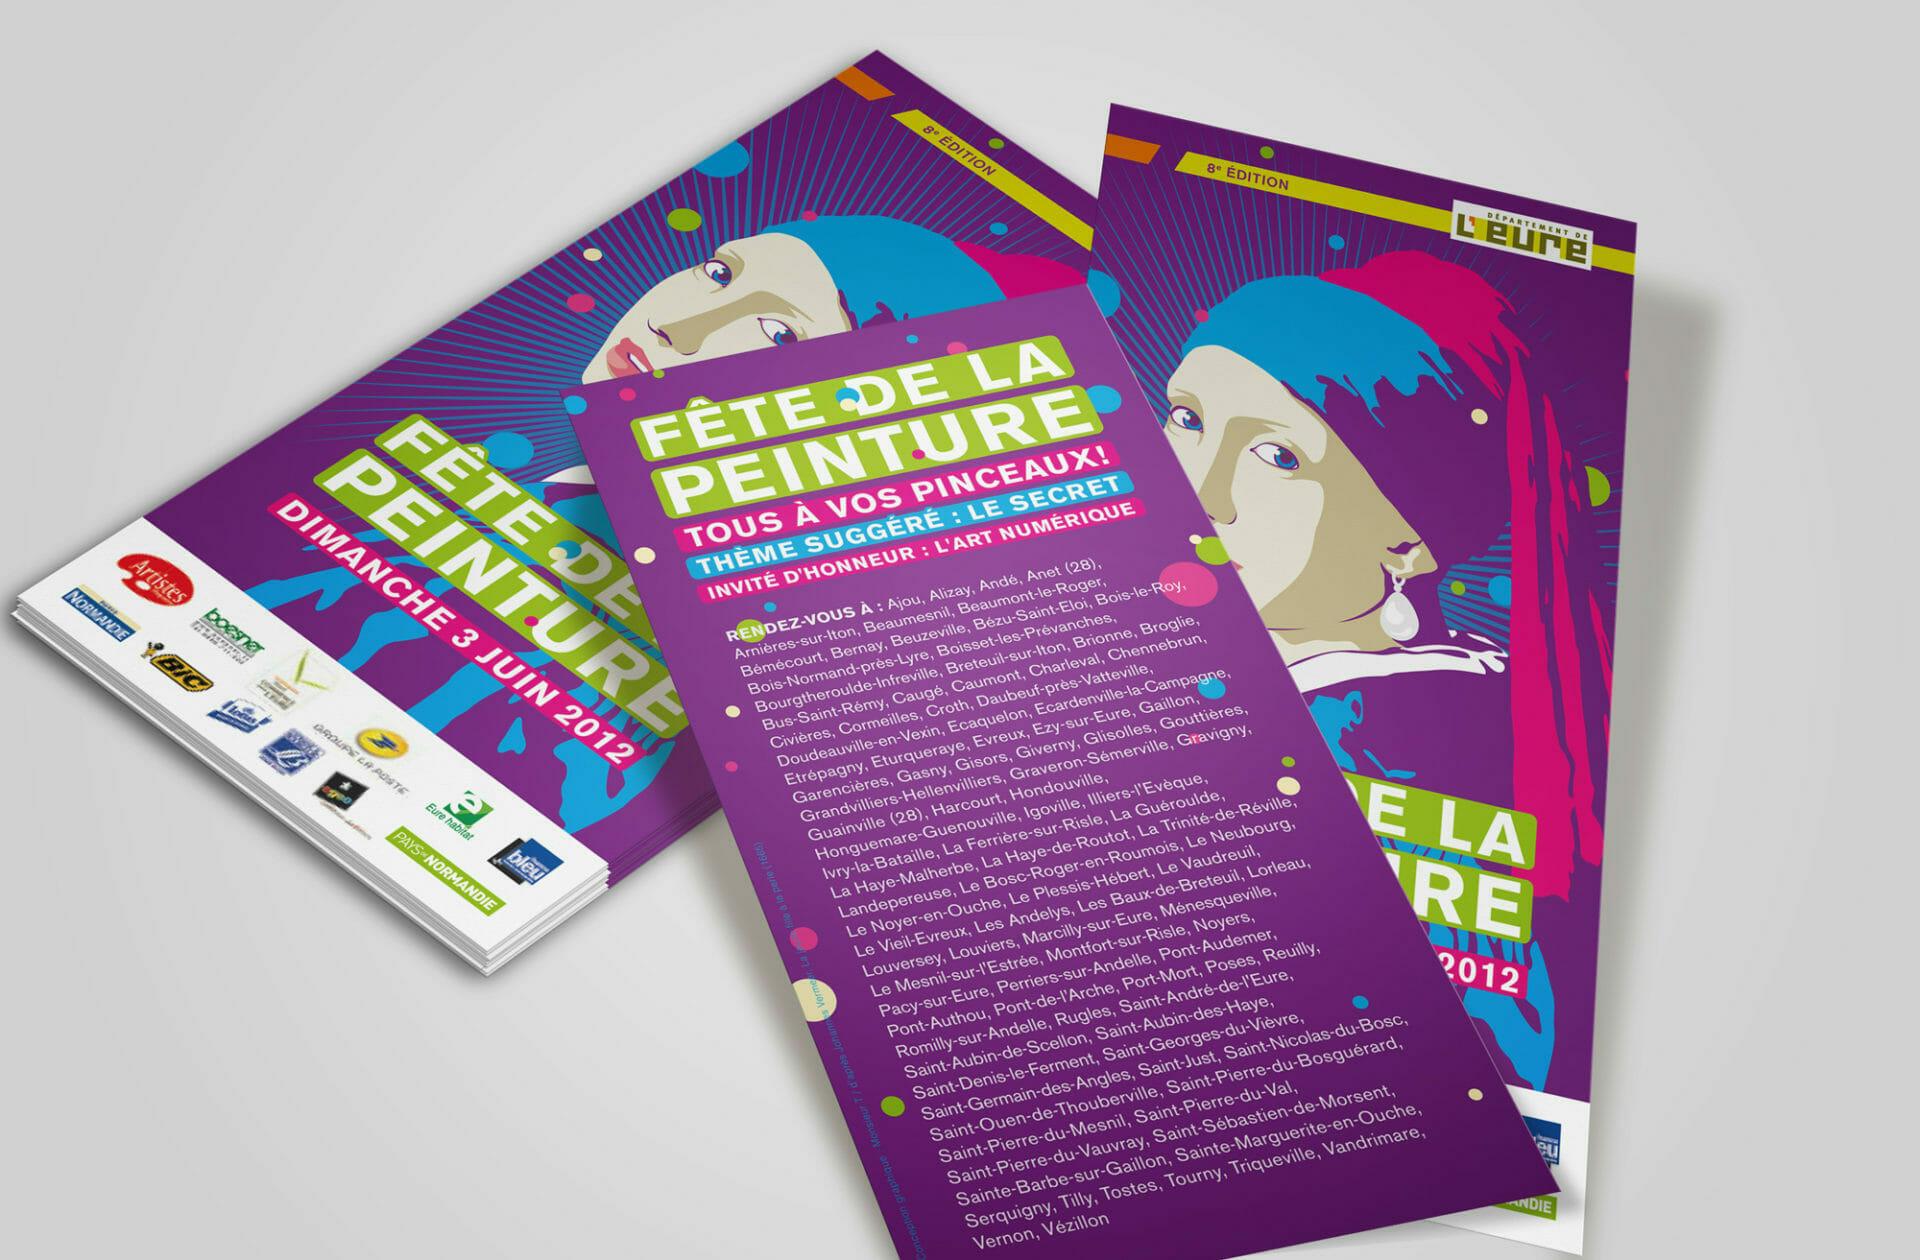 FP2012-flyers-mockup